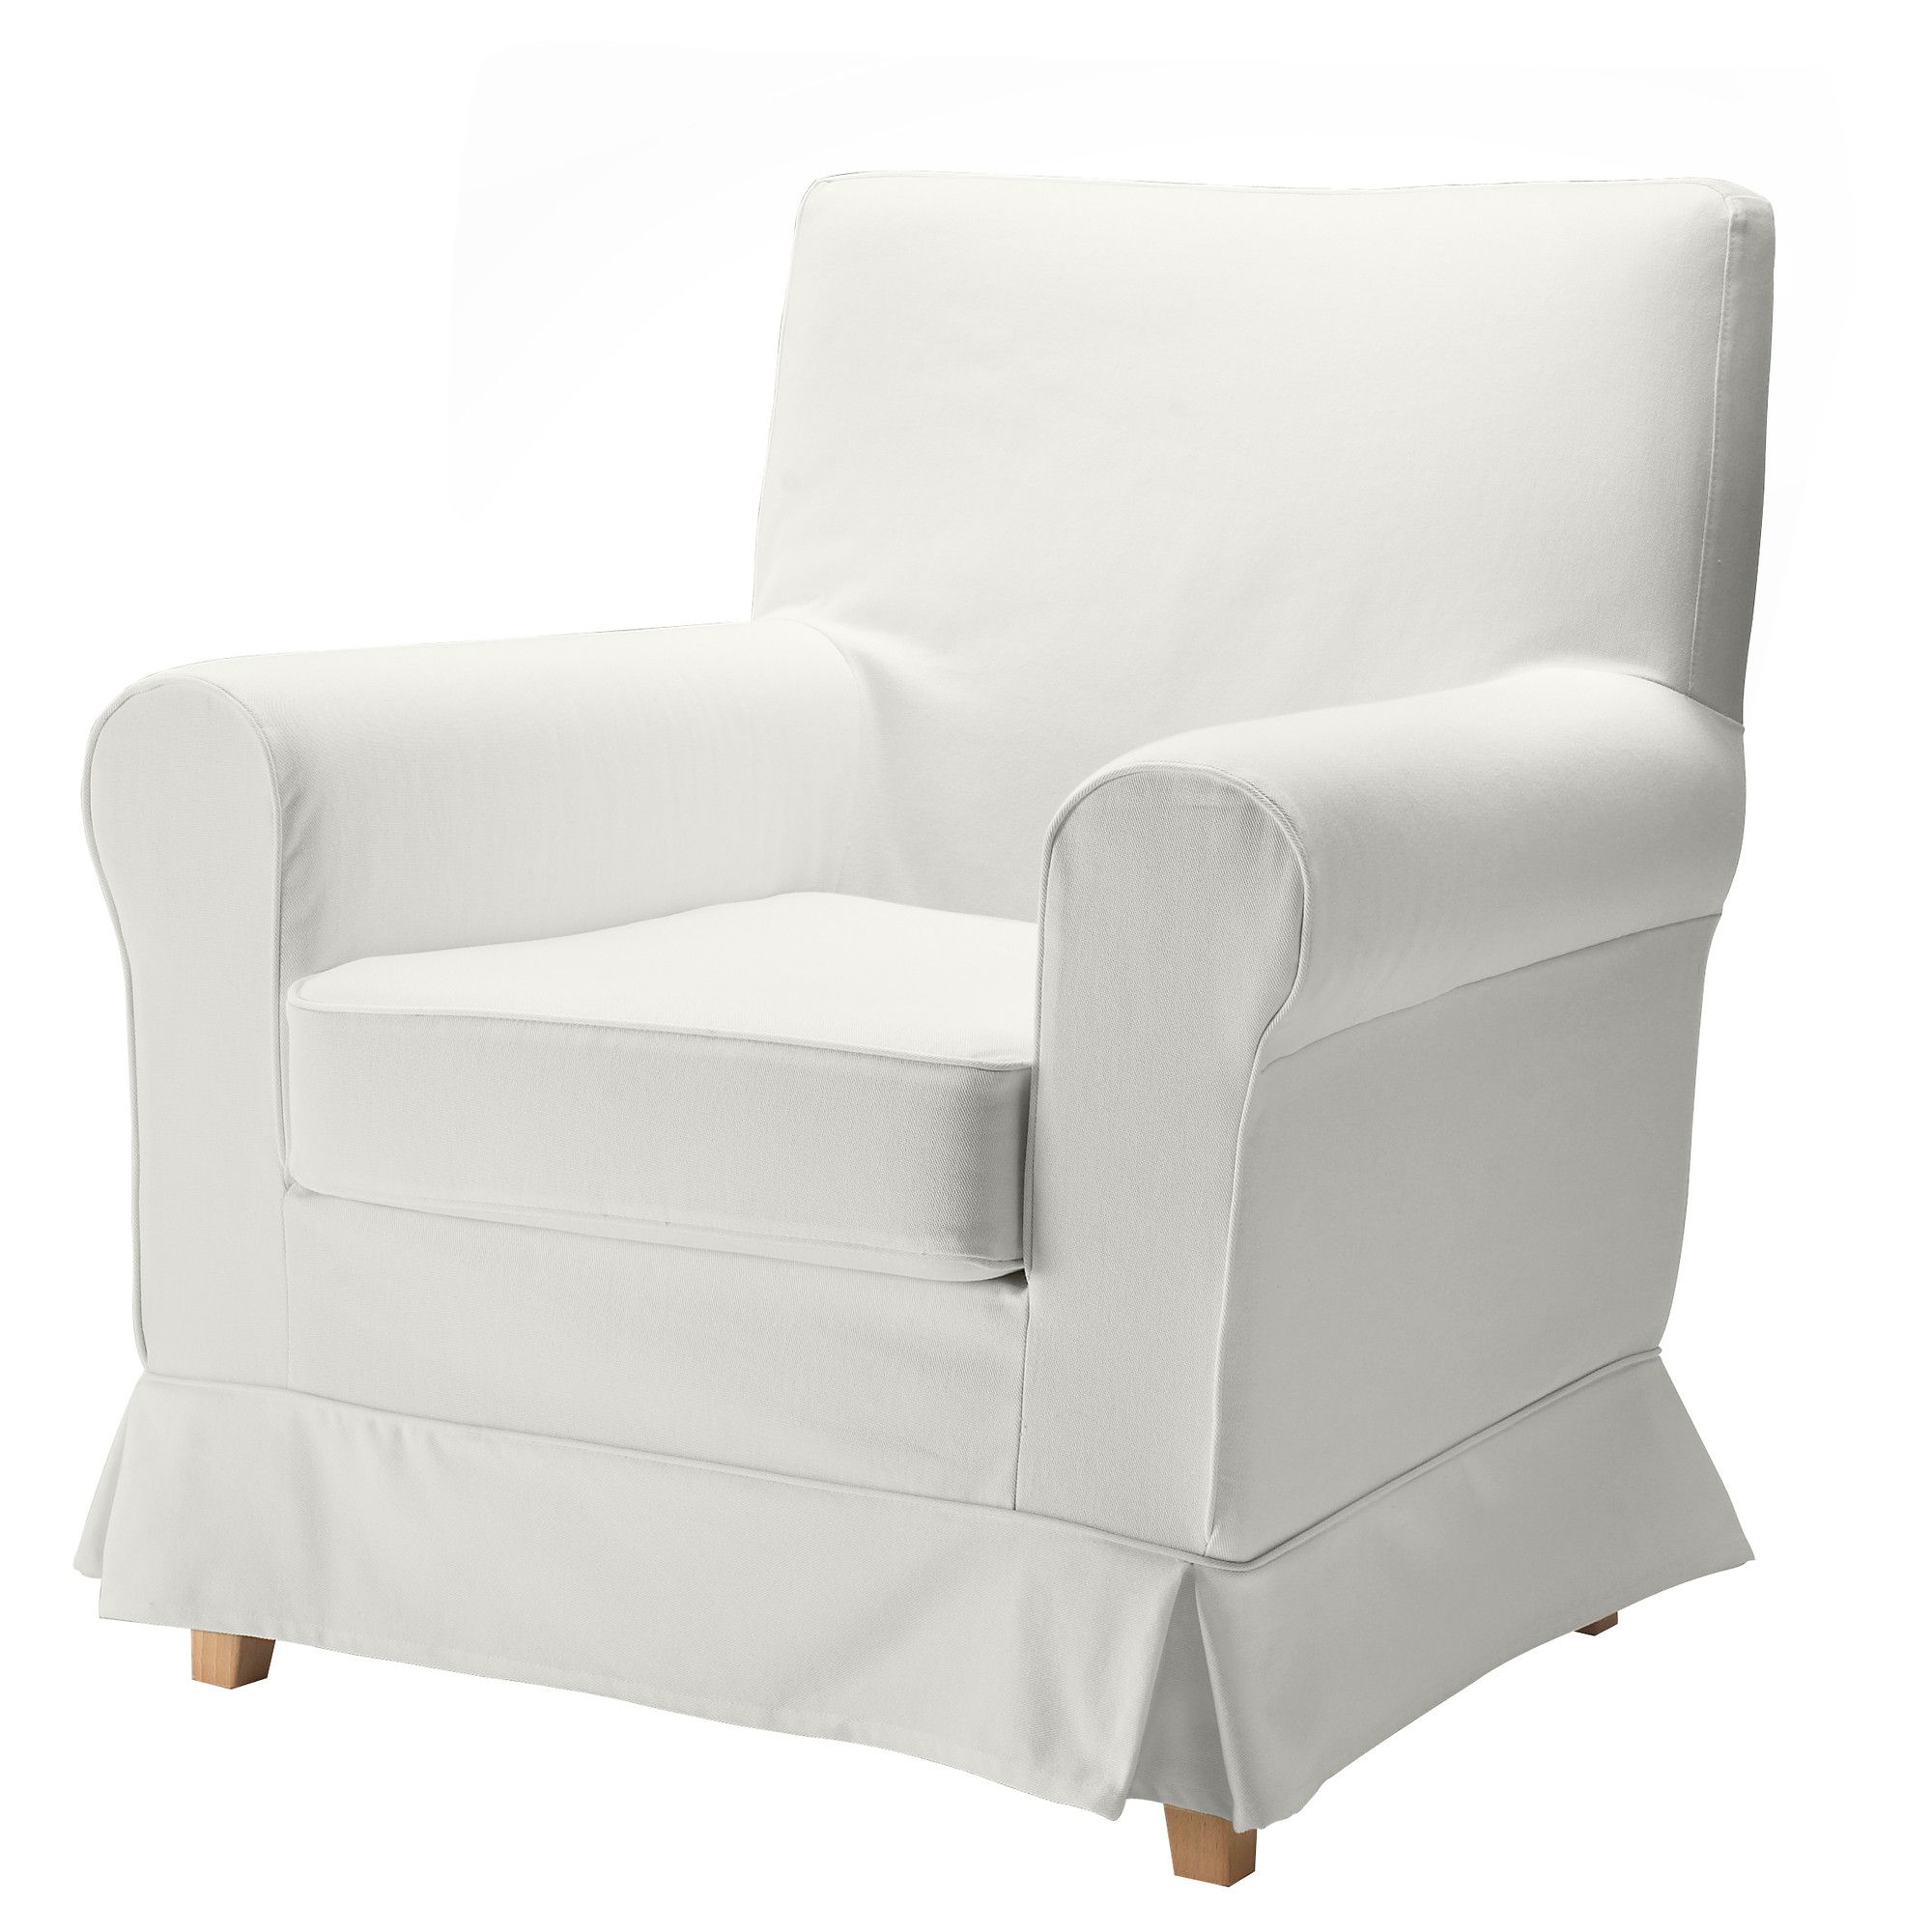 US Furniture and Home Furnishings Ikea armchair, Ikea